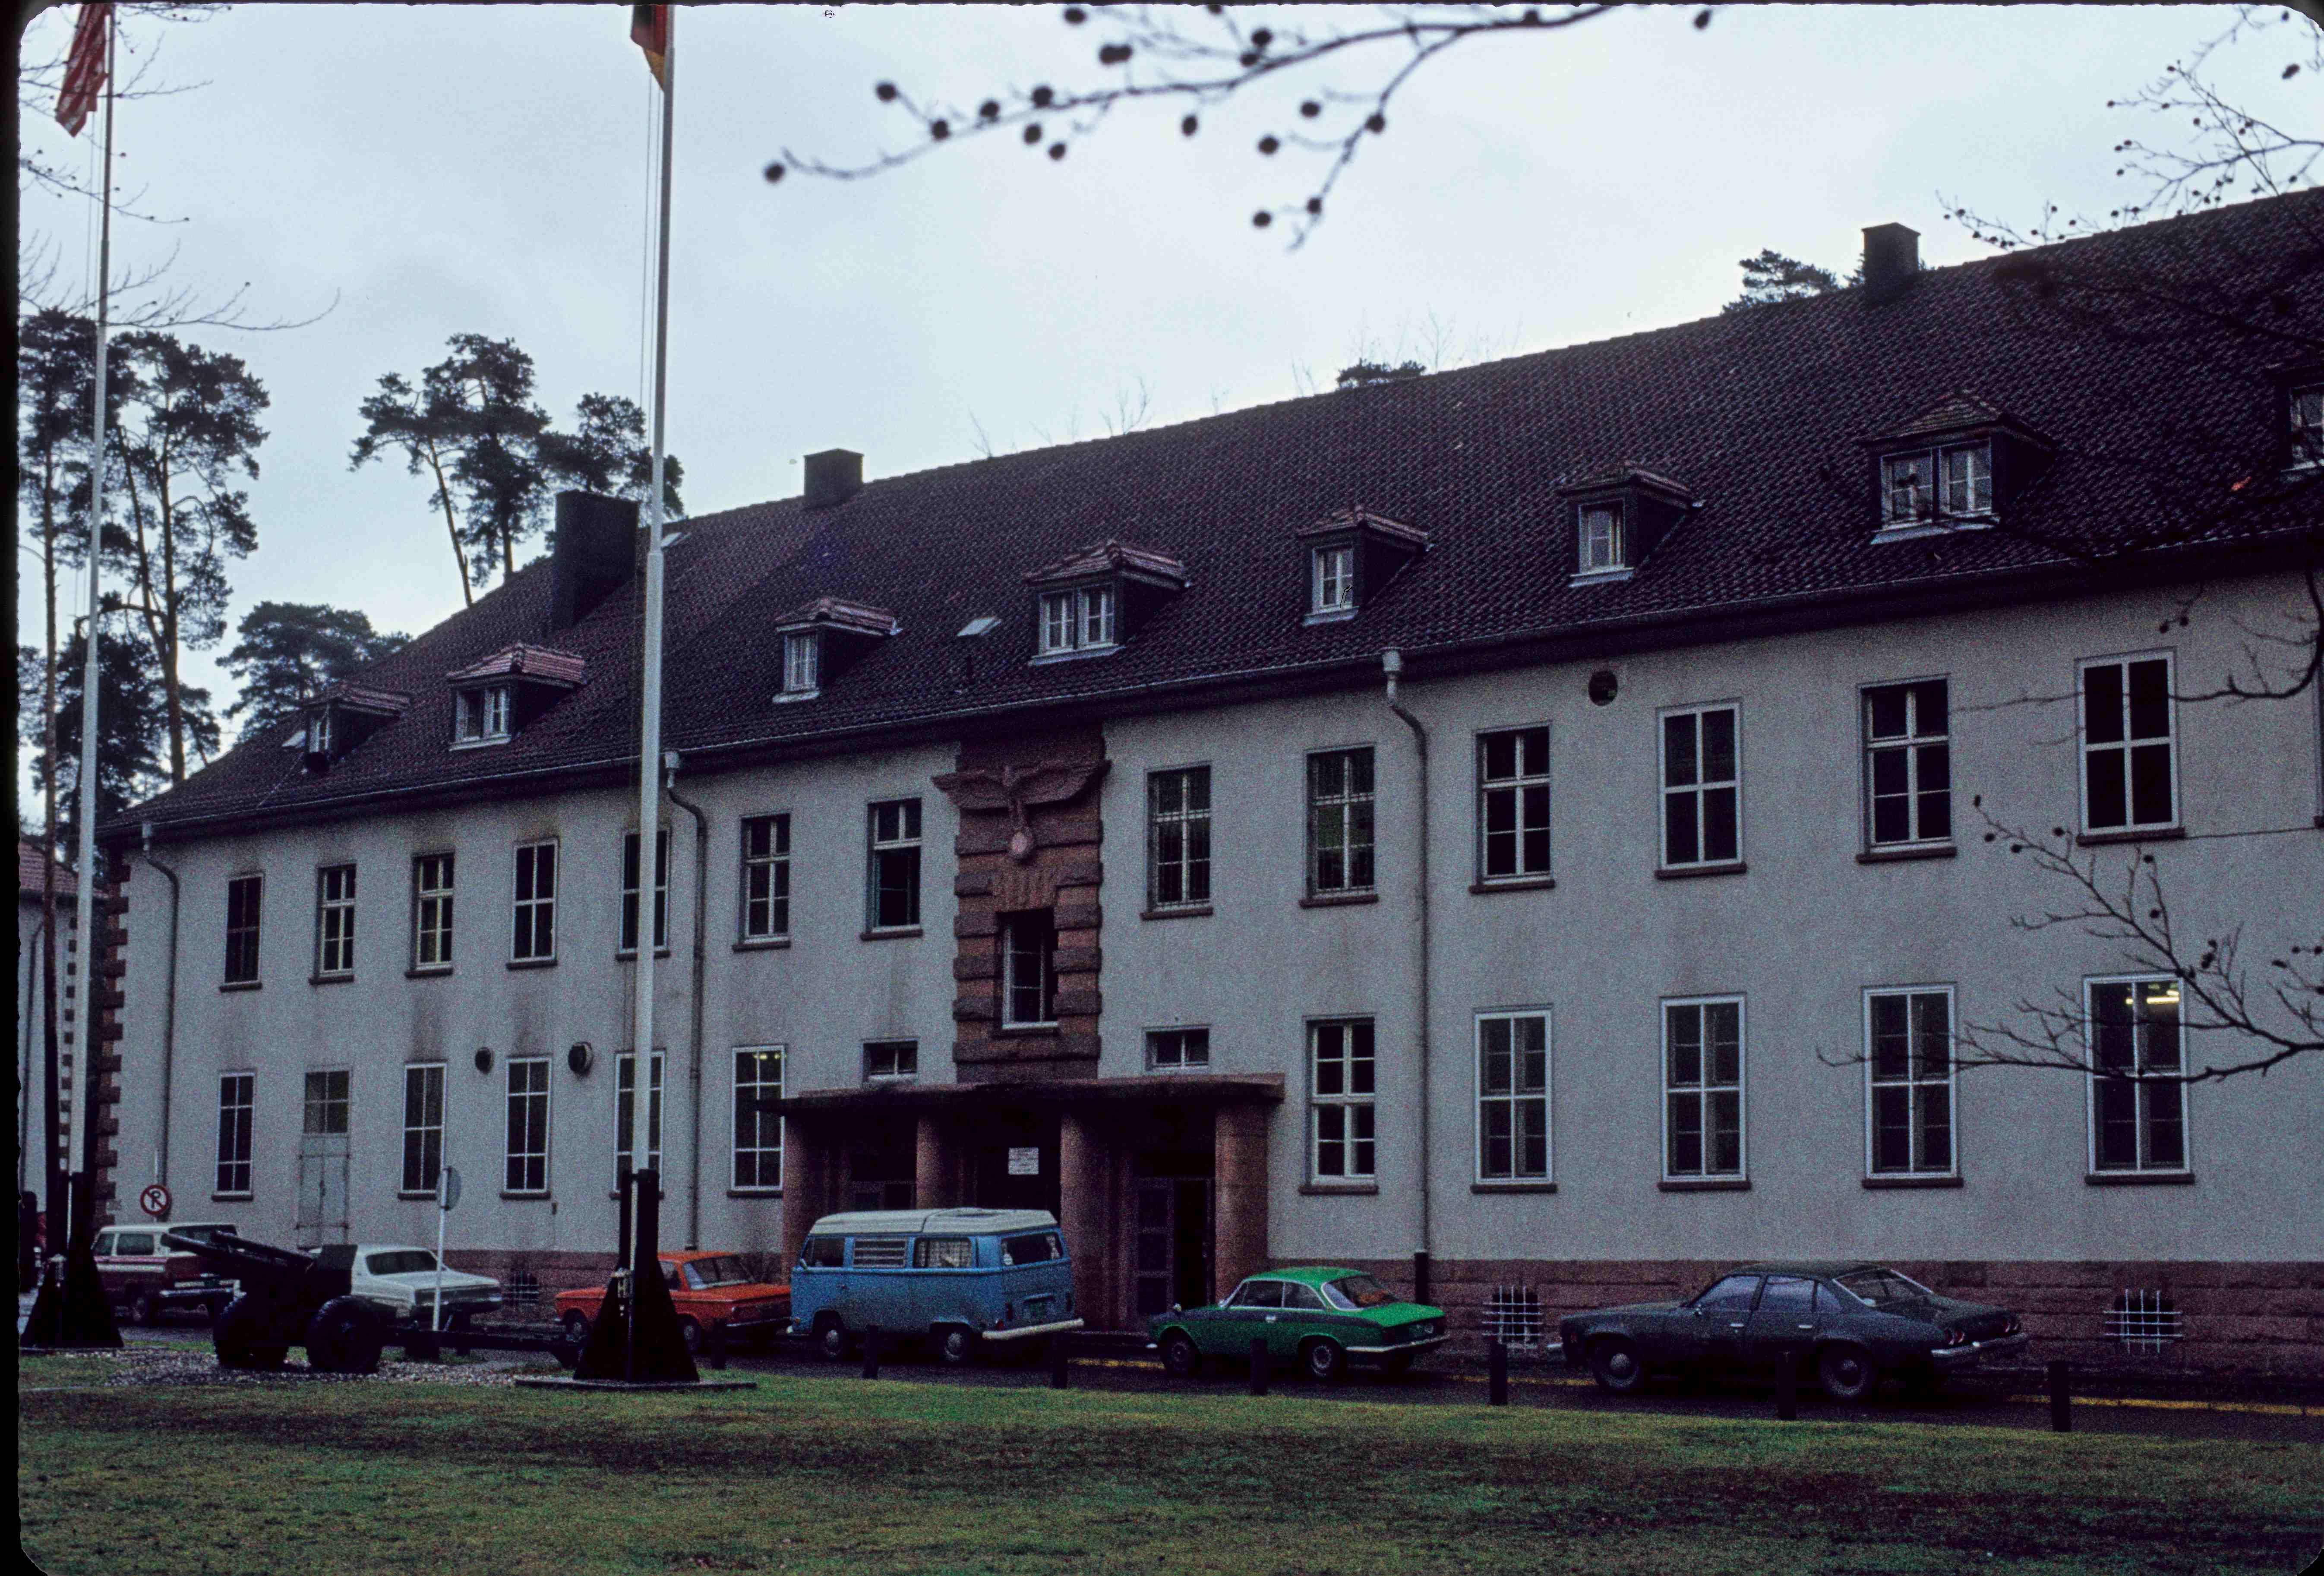 Wiesbaden Air Base Hospital